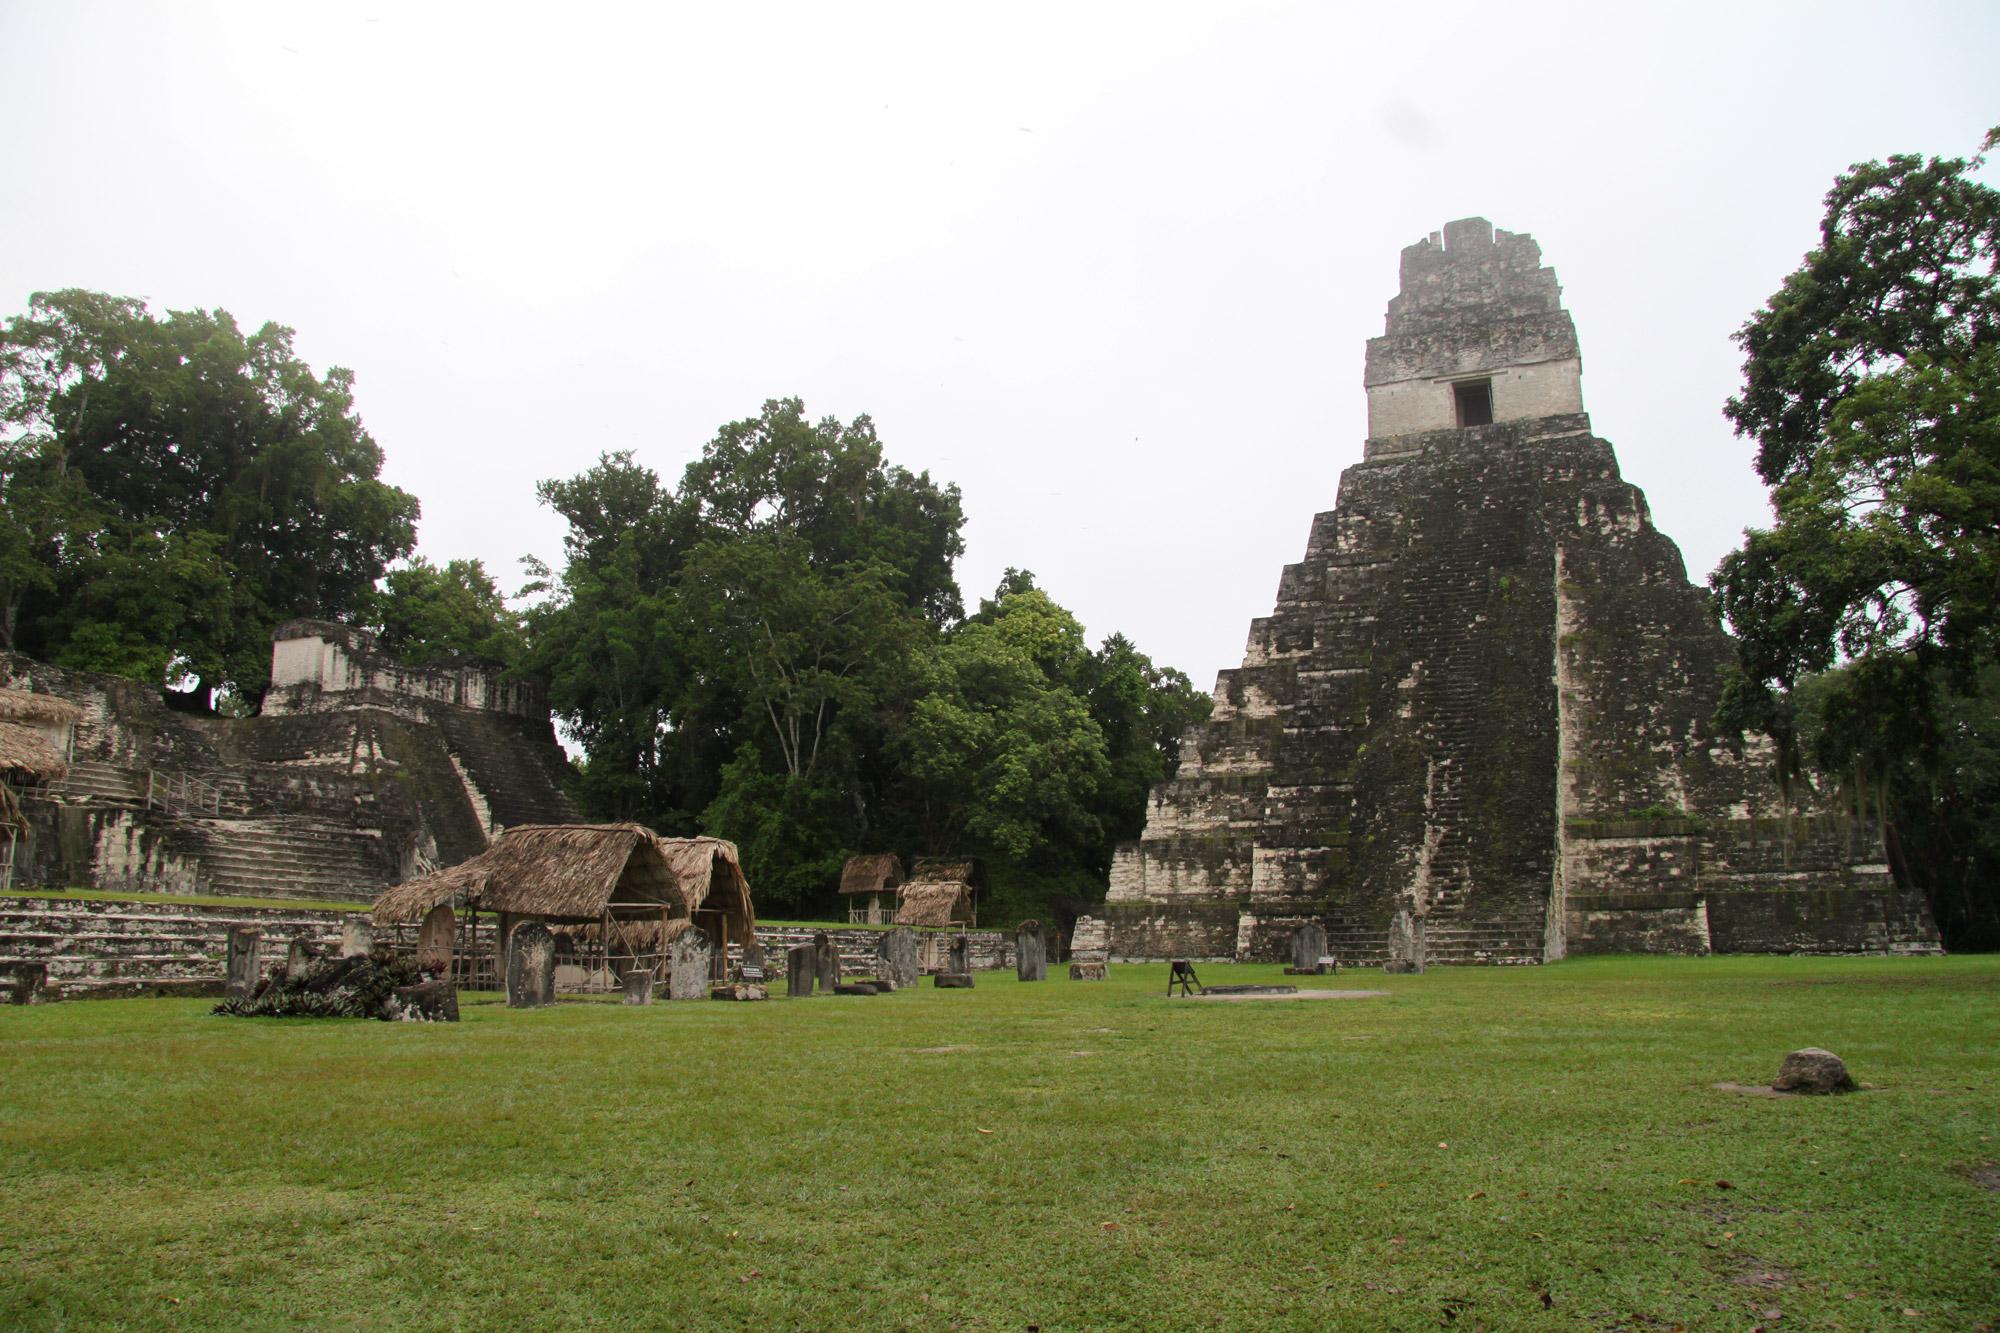 Guatemala 2015 - dag 7 - Templo I in Tikal